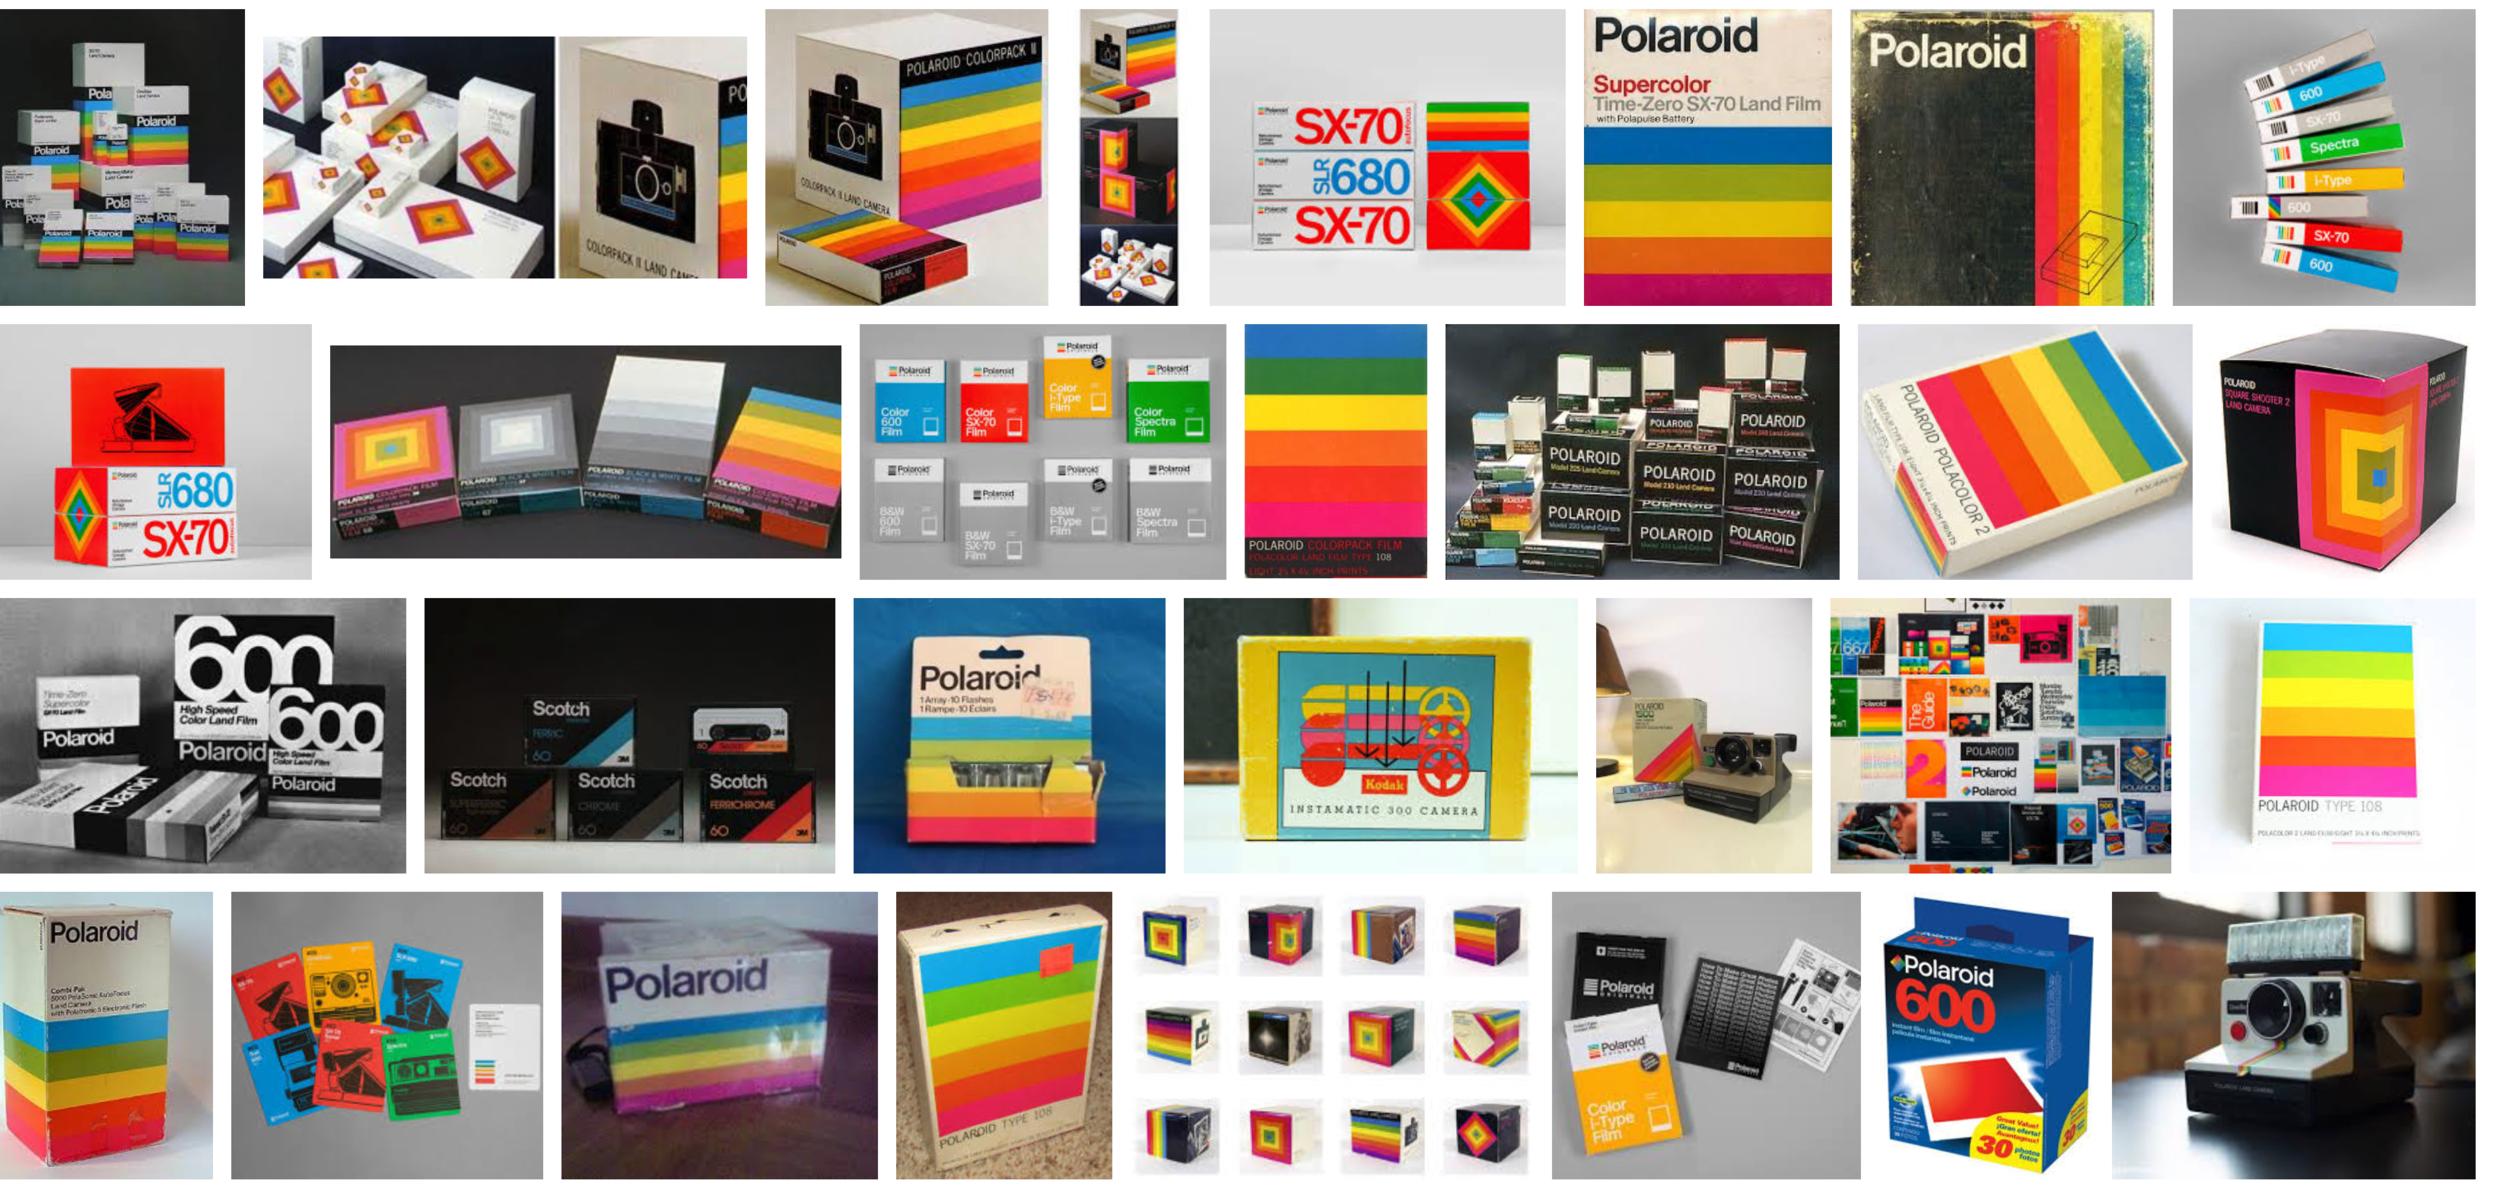 vintage-polaroid.png